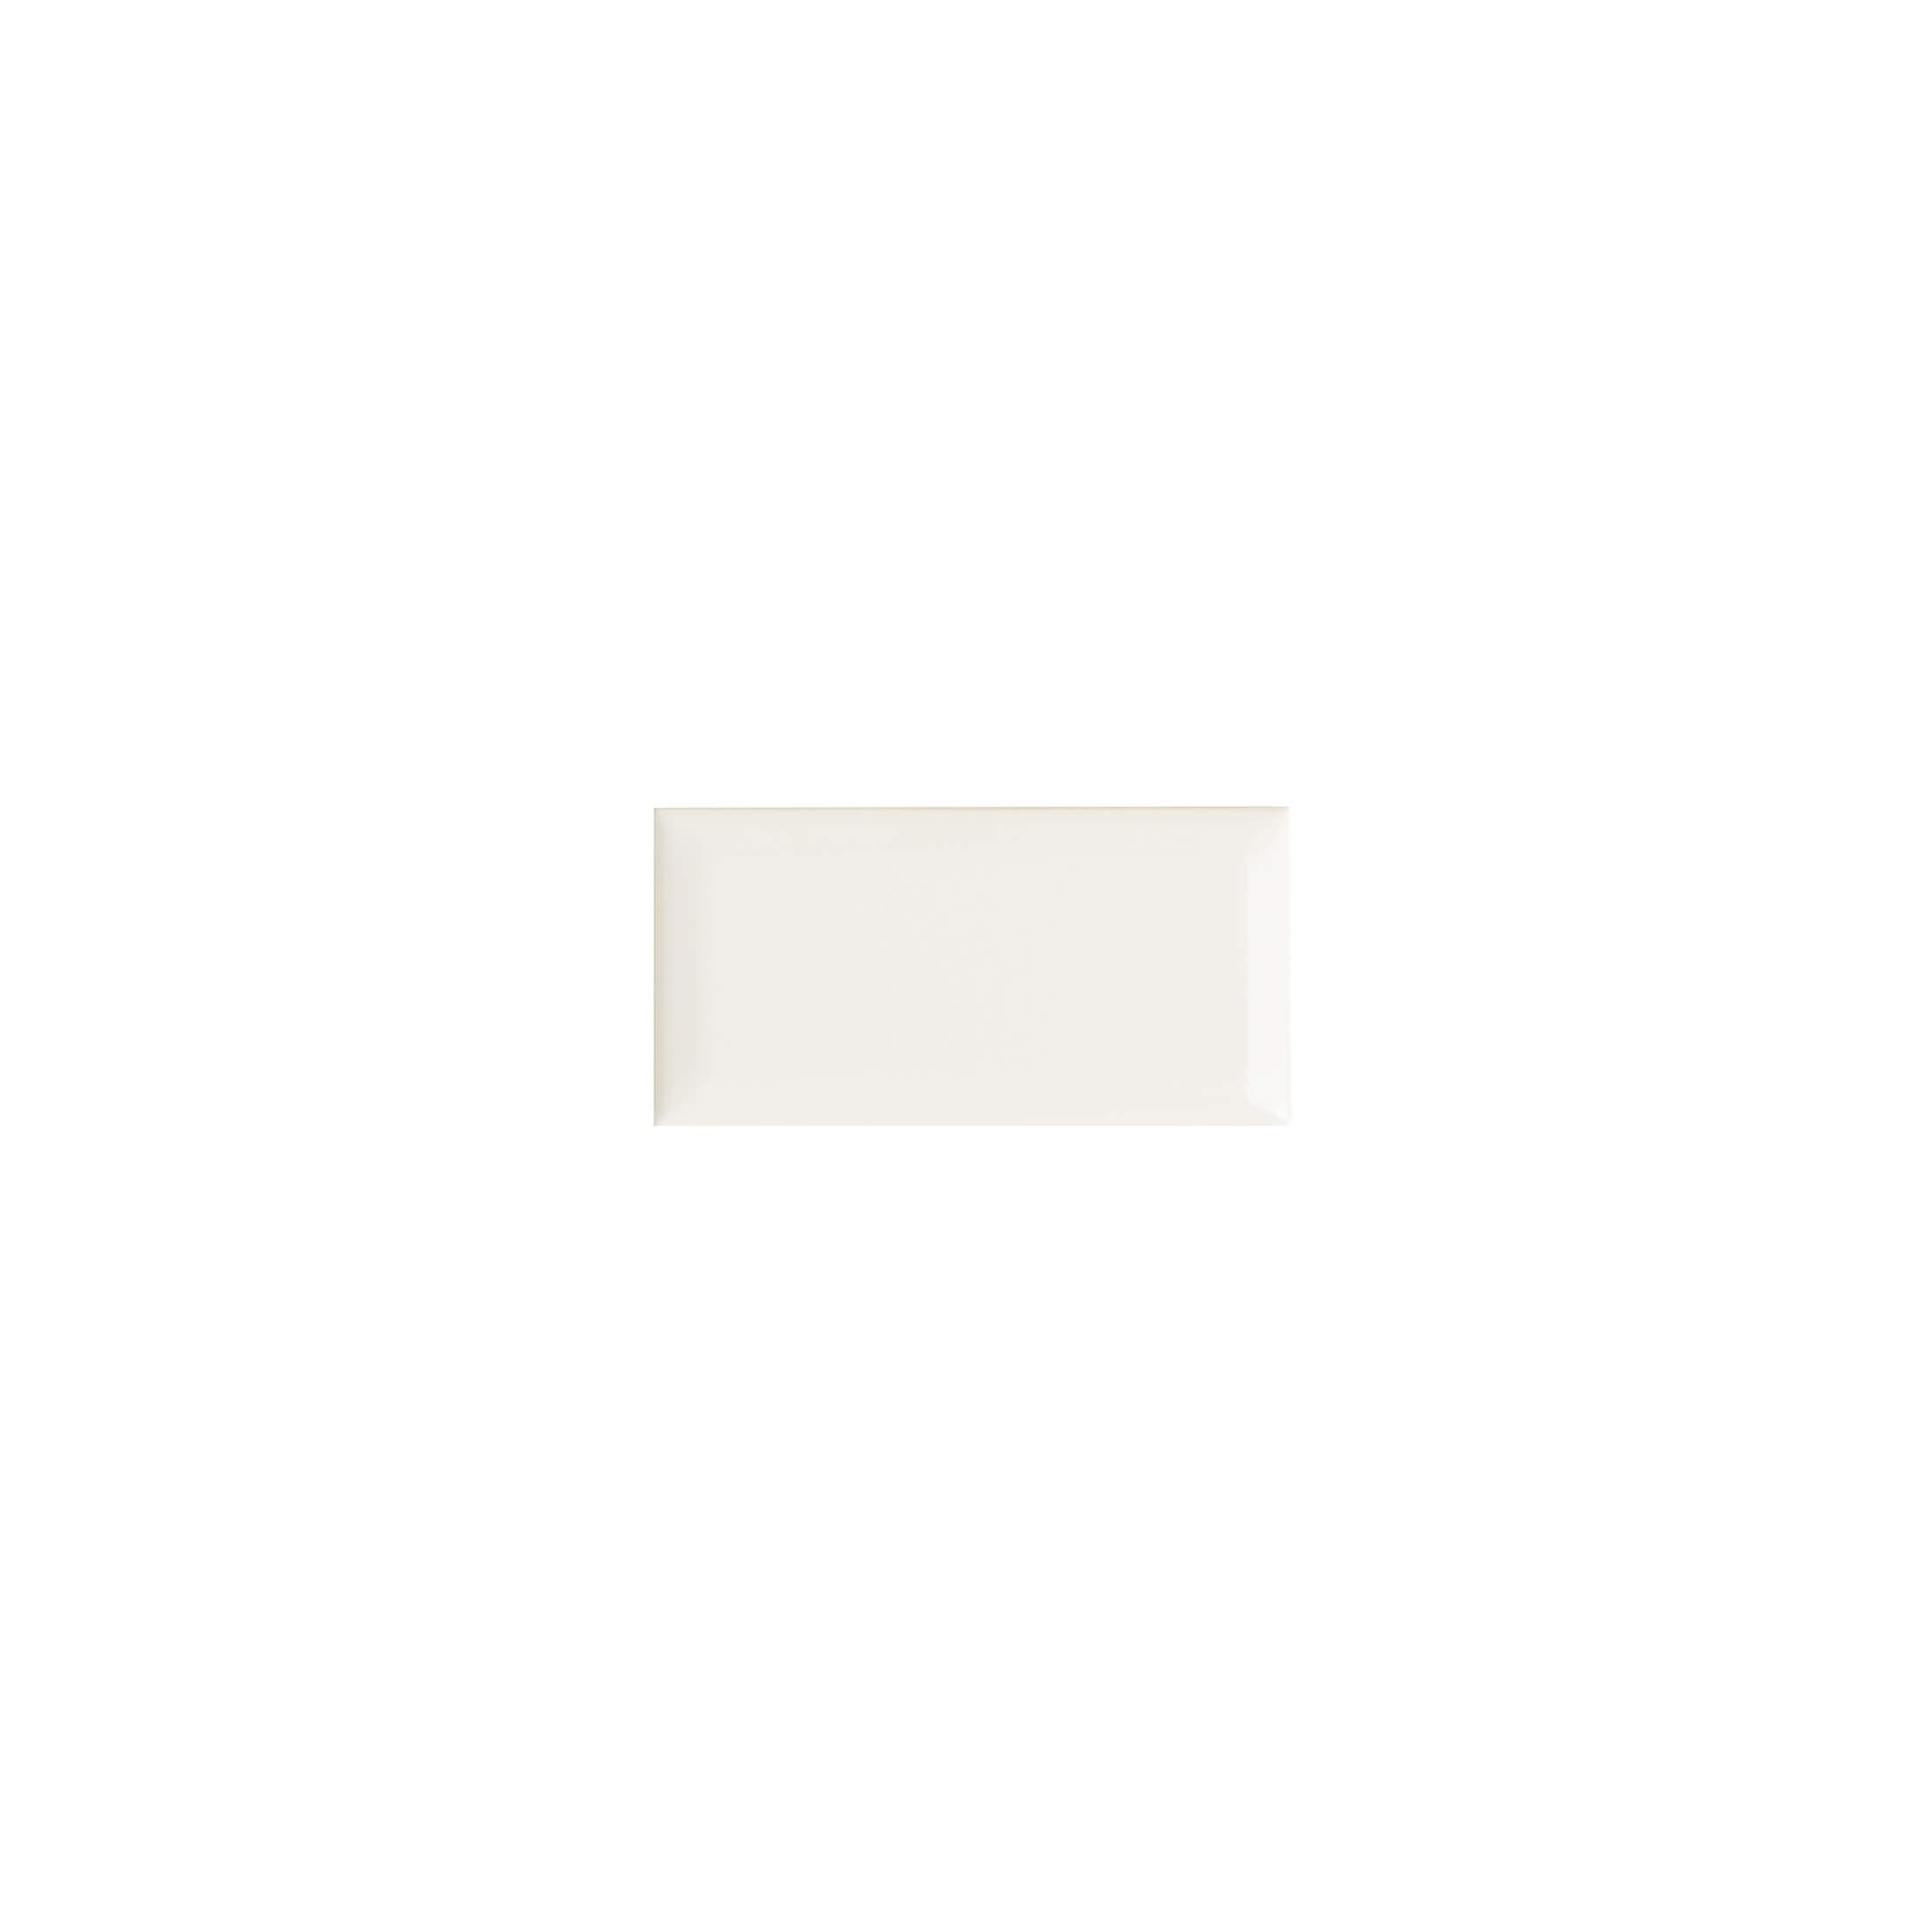 ADNE2025 - BISELADO PB - 5 cm X 10 cm